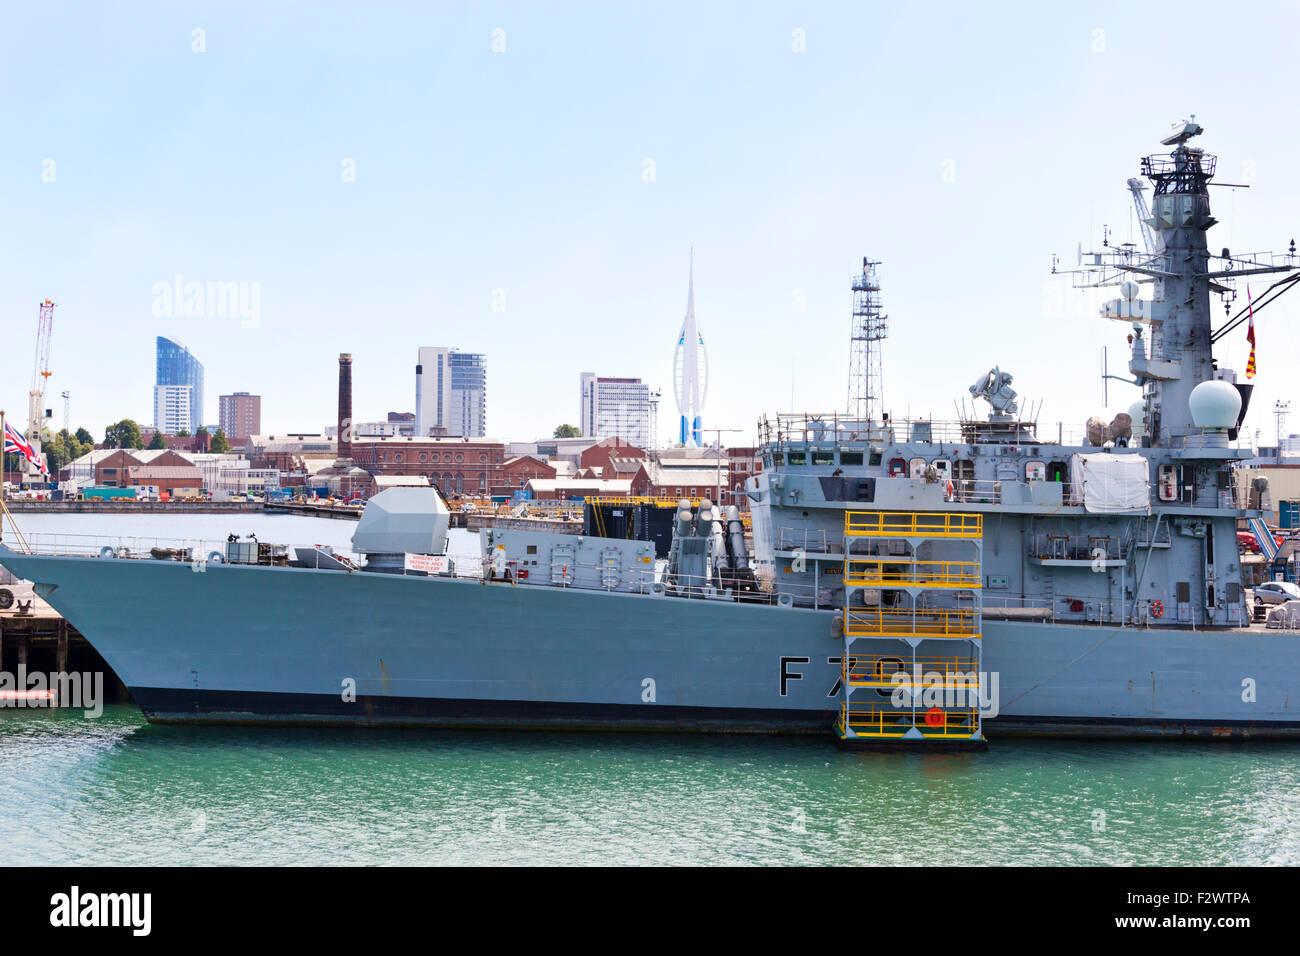 HMS Kent a Type 23 Duke class frigate of the British Royal Navy at Portsmouth Naval Base. Hampshire UK - Stock Image